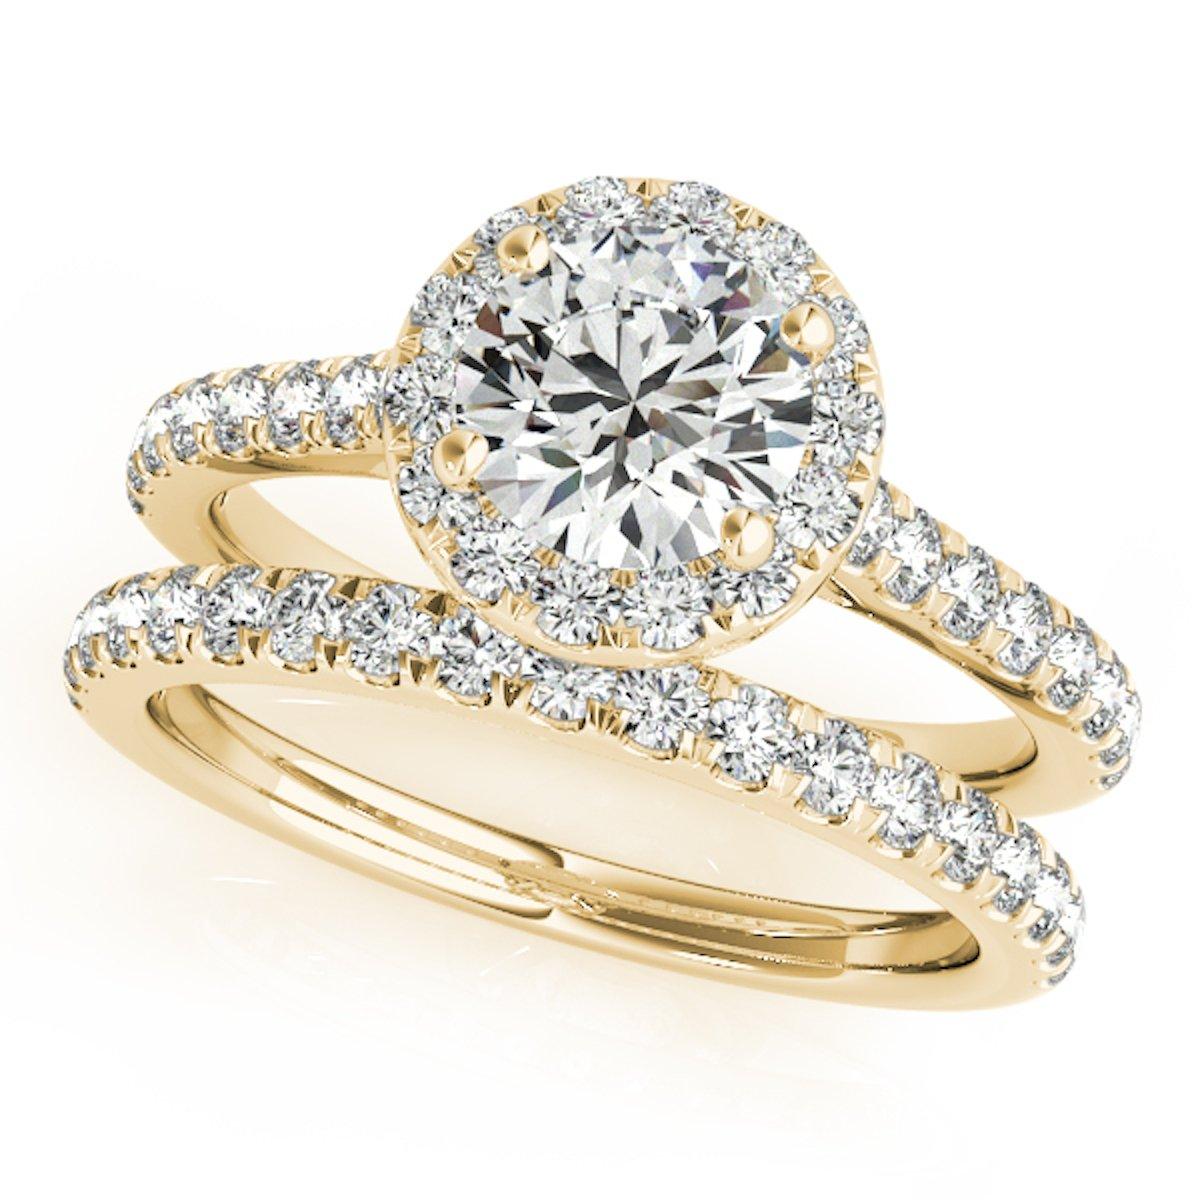 MauliJewels 0.75 Ct. Diamond Engagement Bridal Ring Set 14K Solid Yellow Gold